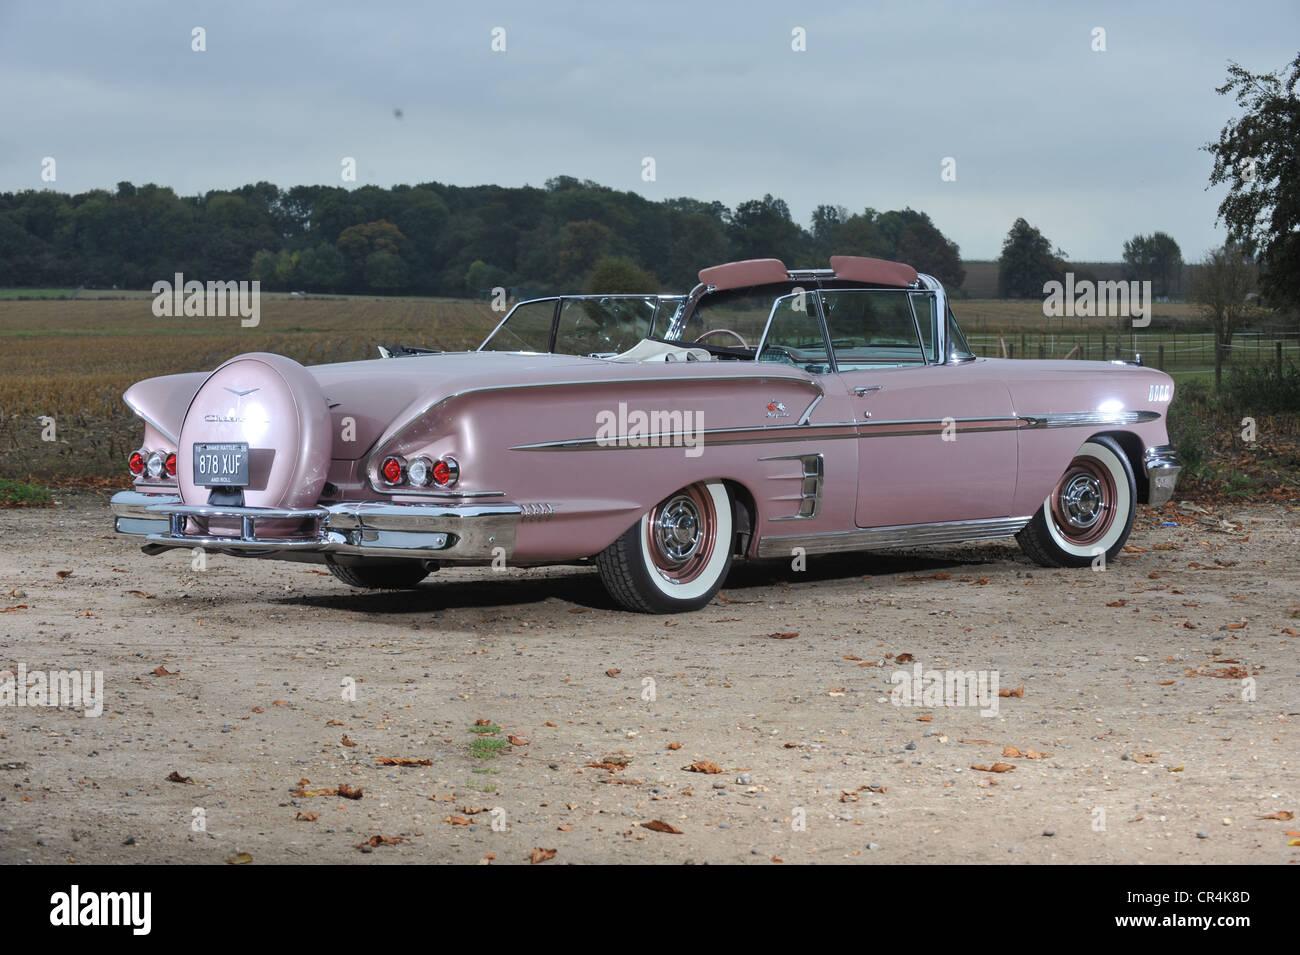 Impala 1958 chevrolet impala : 1958 Chevrolet Impala convertible classic American car Stock Photo ...